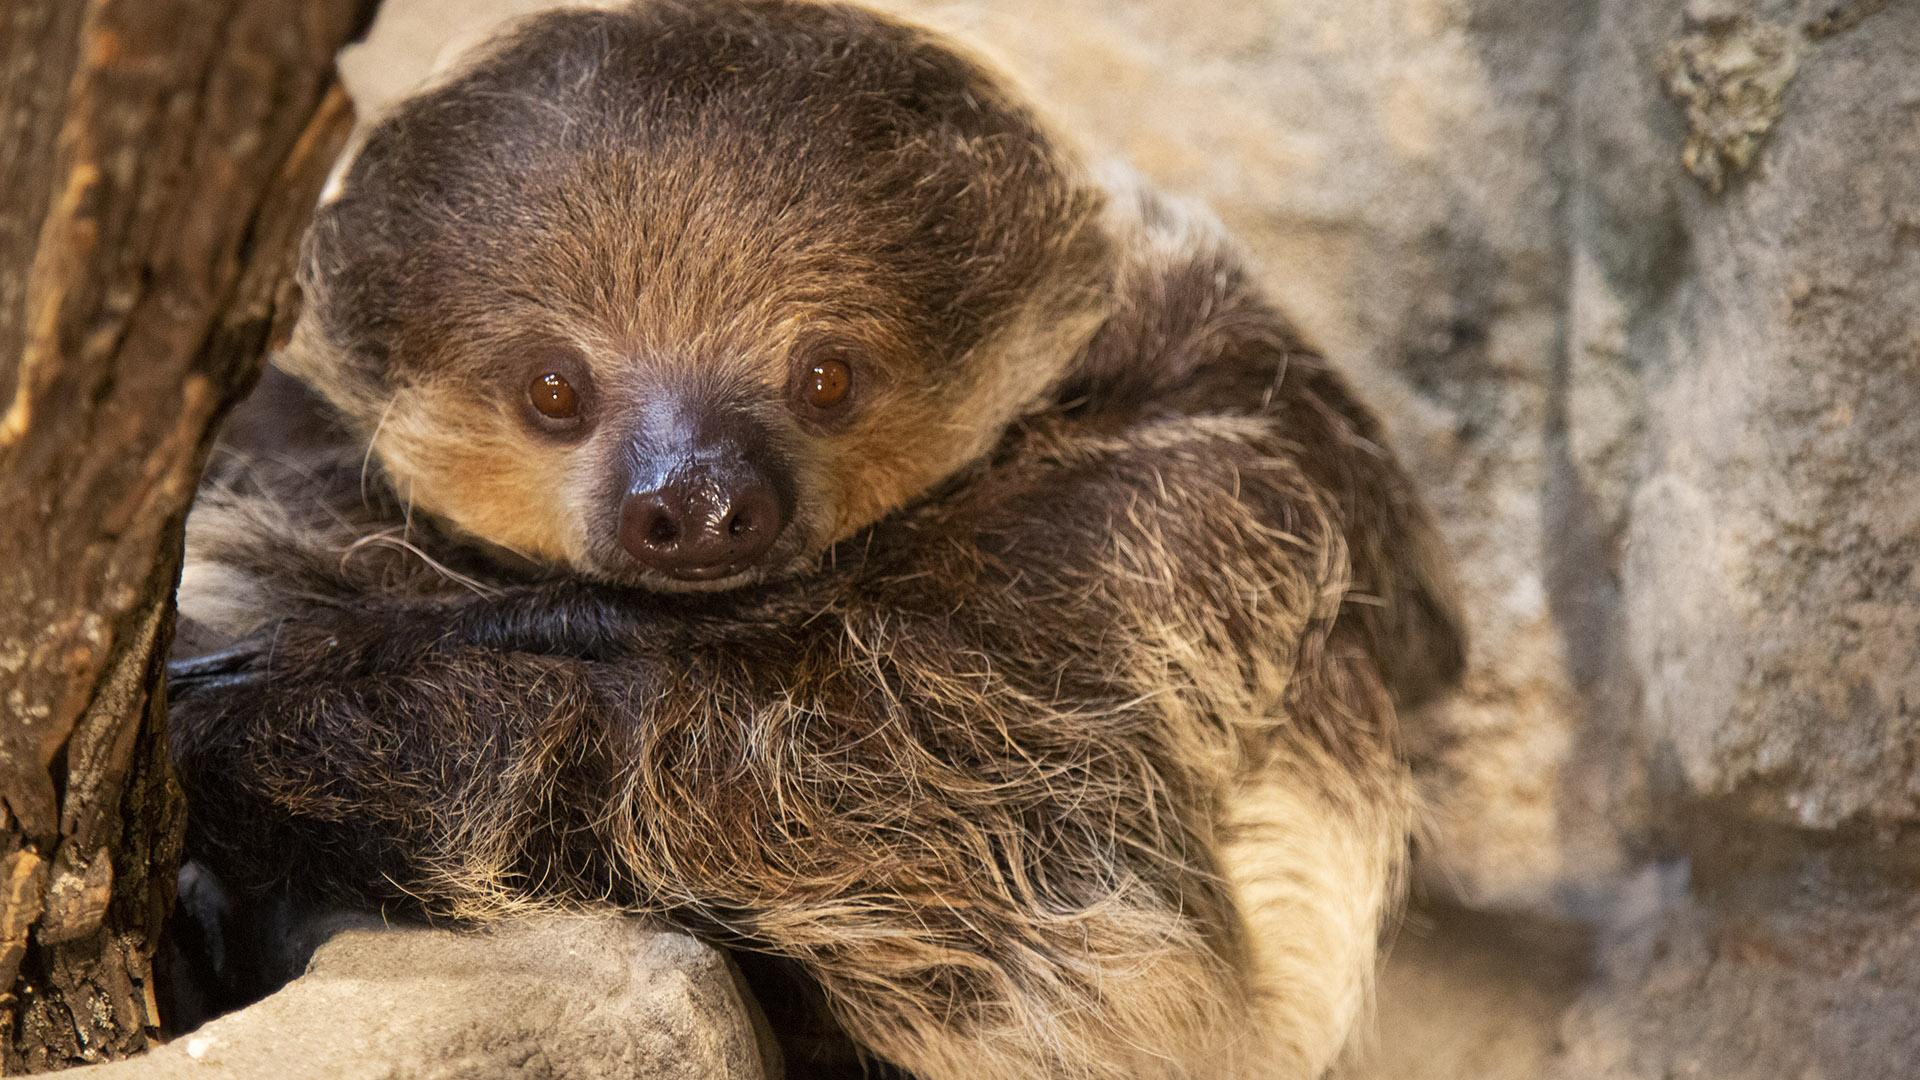 Two toed sloth at Lake Tobias Wildlife Park